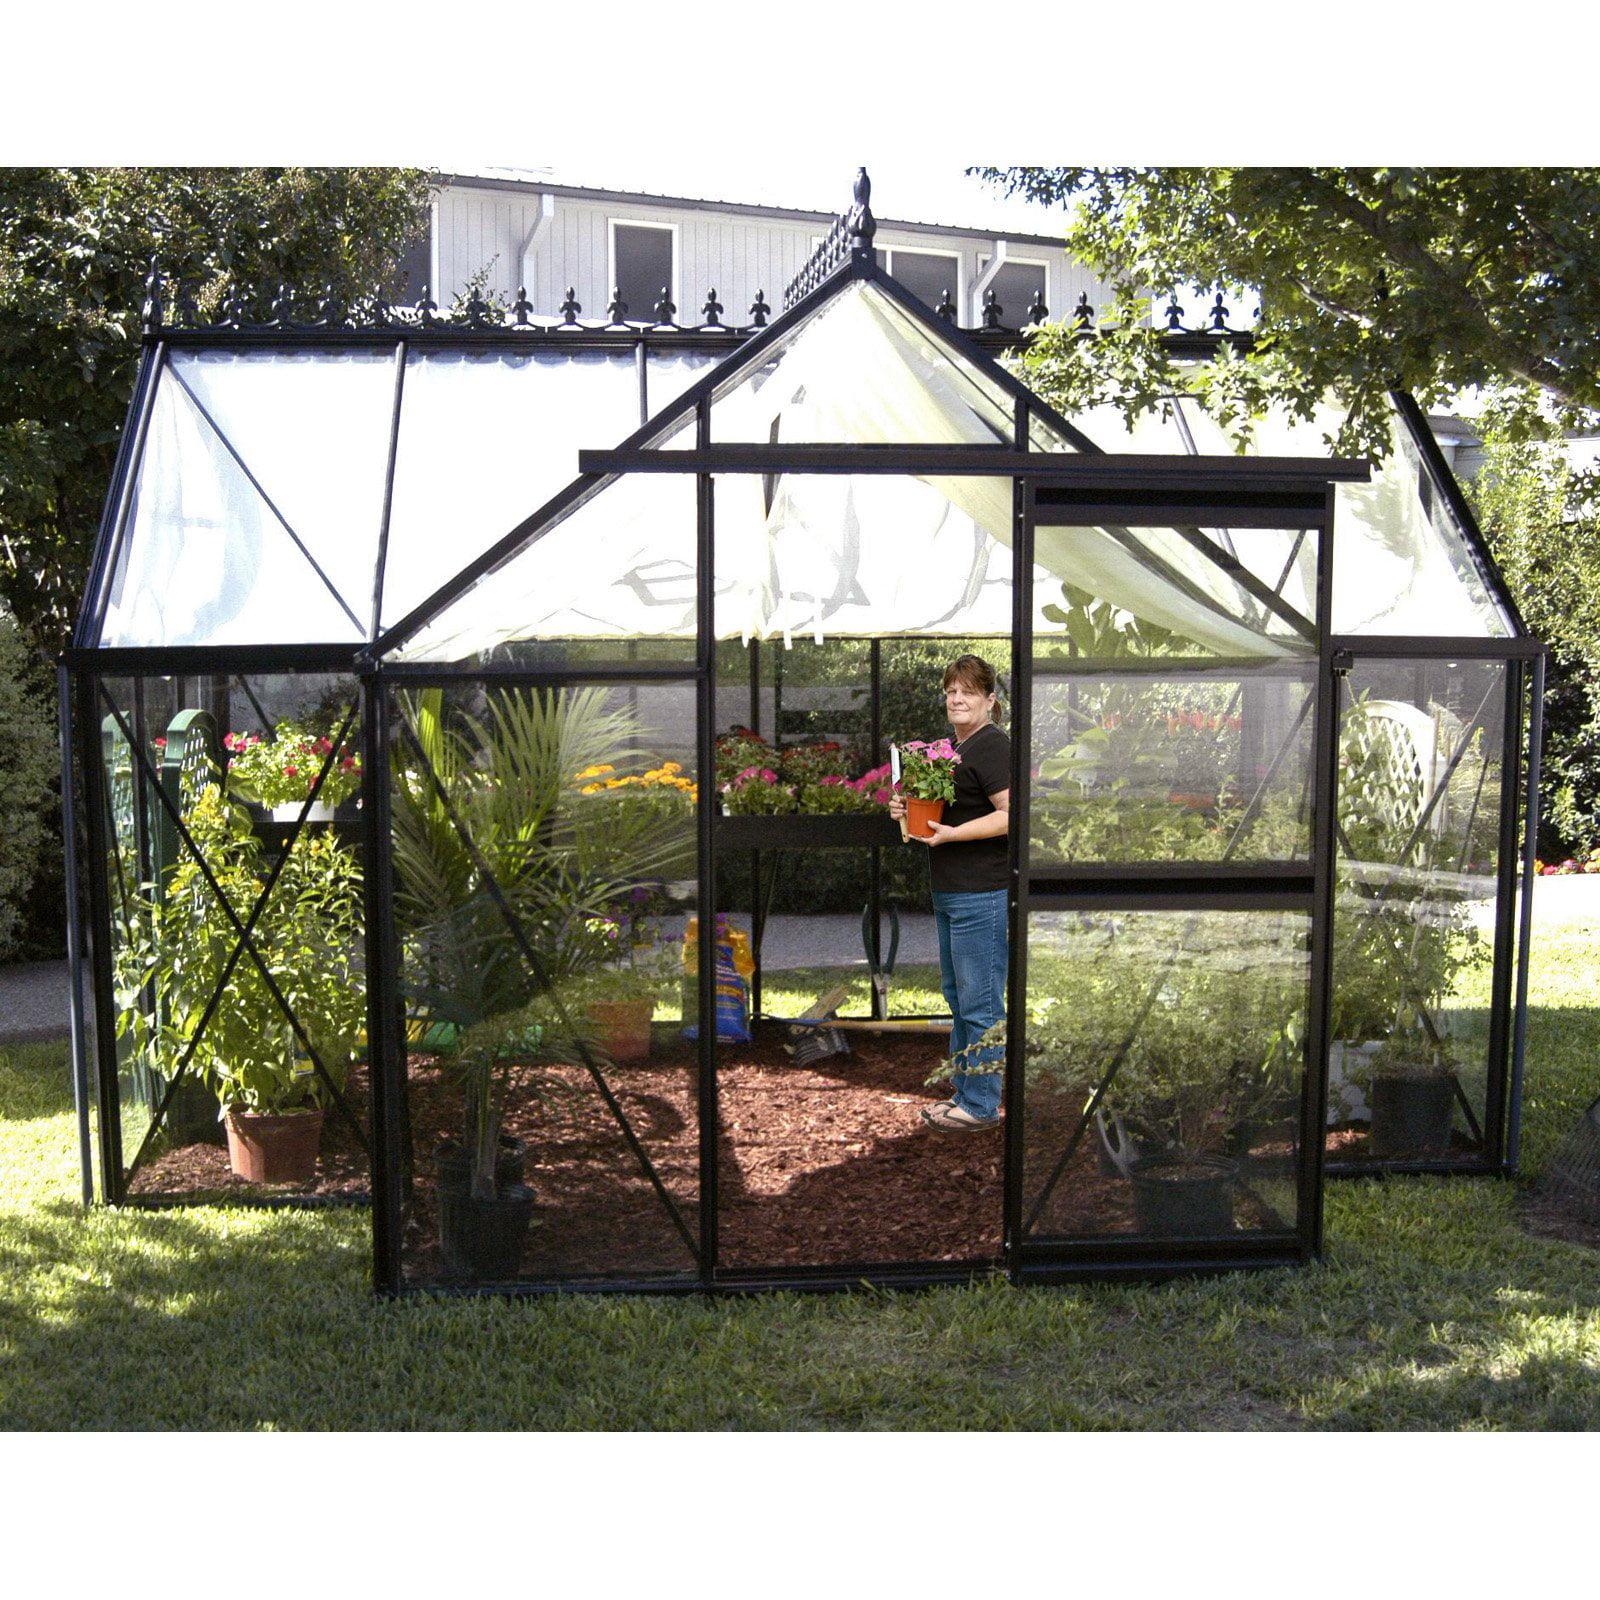 Janssens Junior Orangerie 13 x 10.25-Foot Greenhouse by Exaco